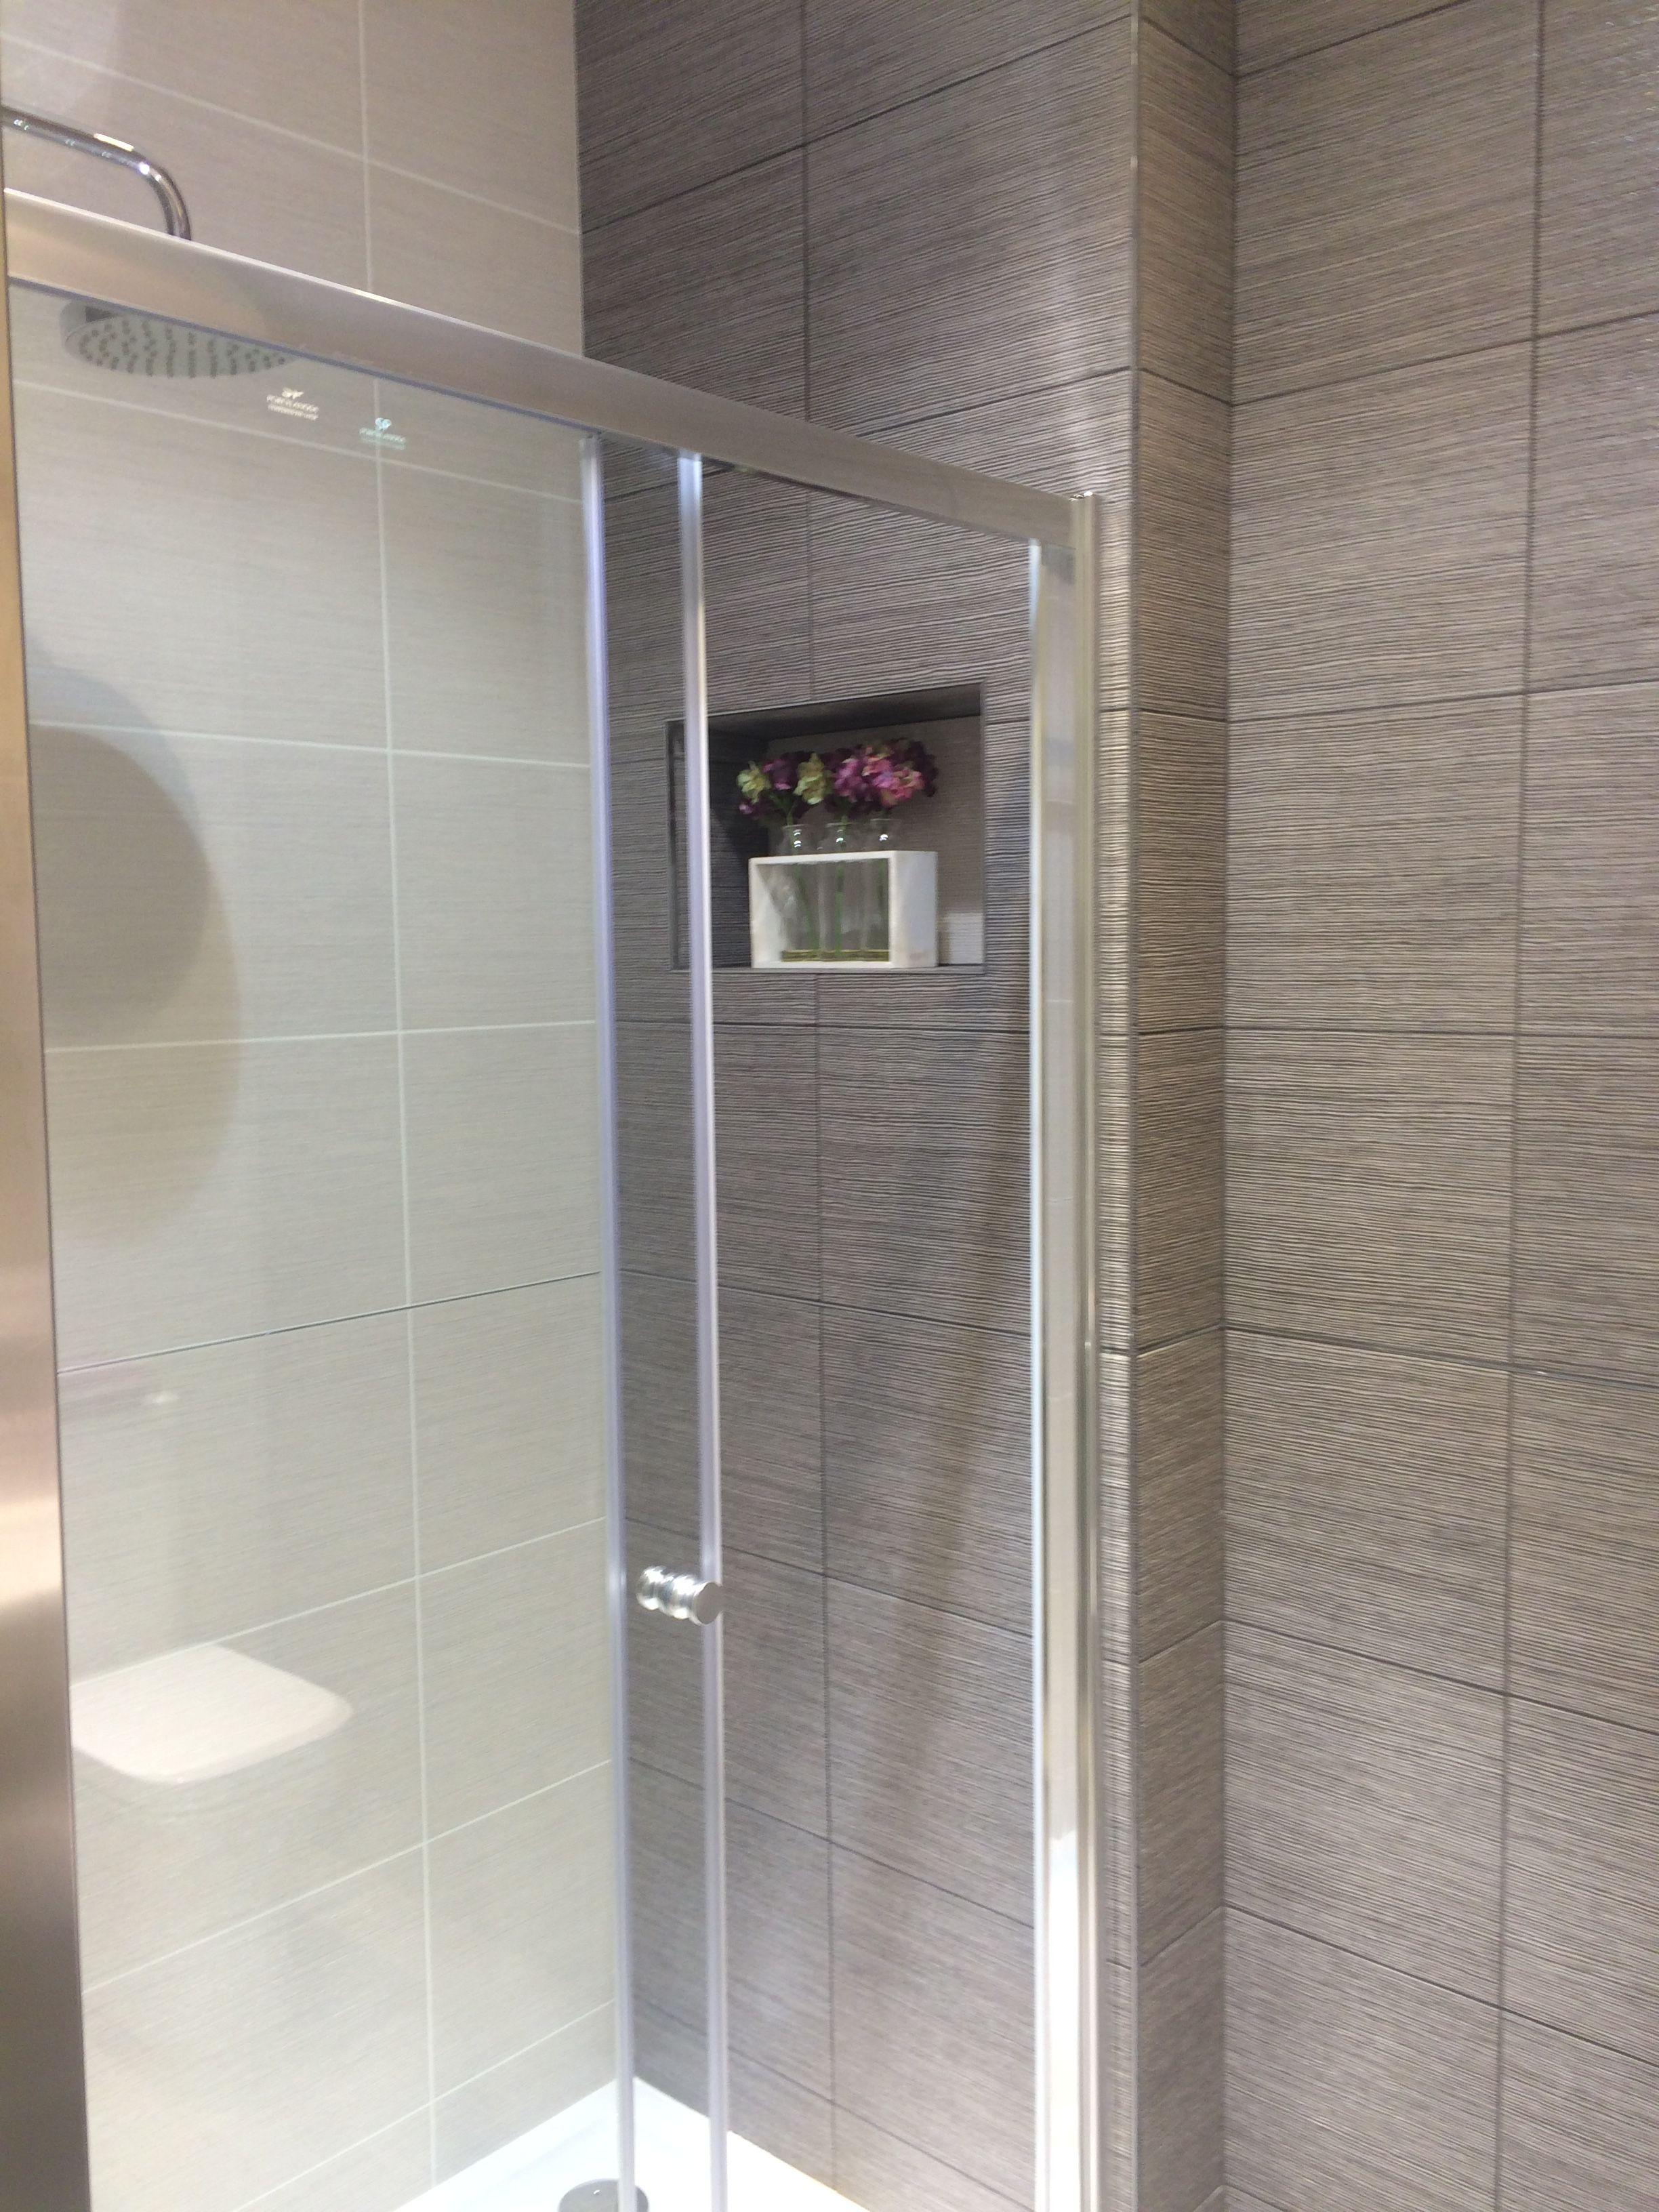 Porcelanosa japan marine and blanco tiles bathroom for Porcelanosa bathroom floor tiles